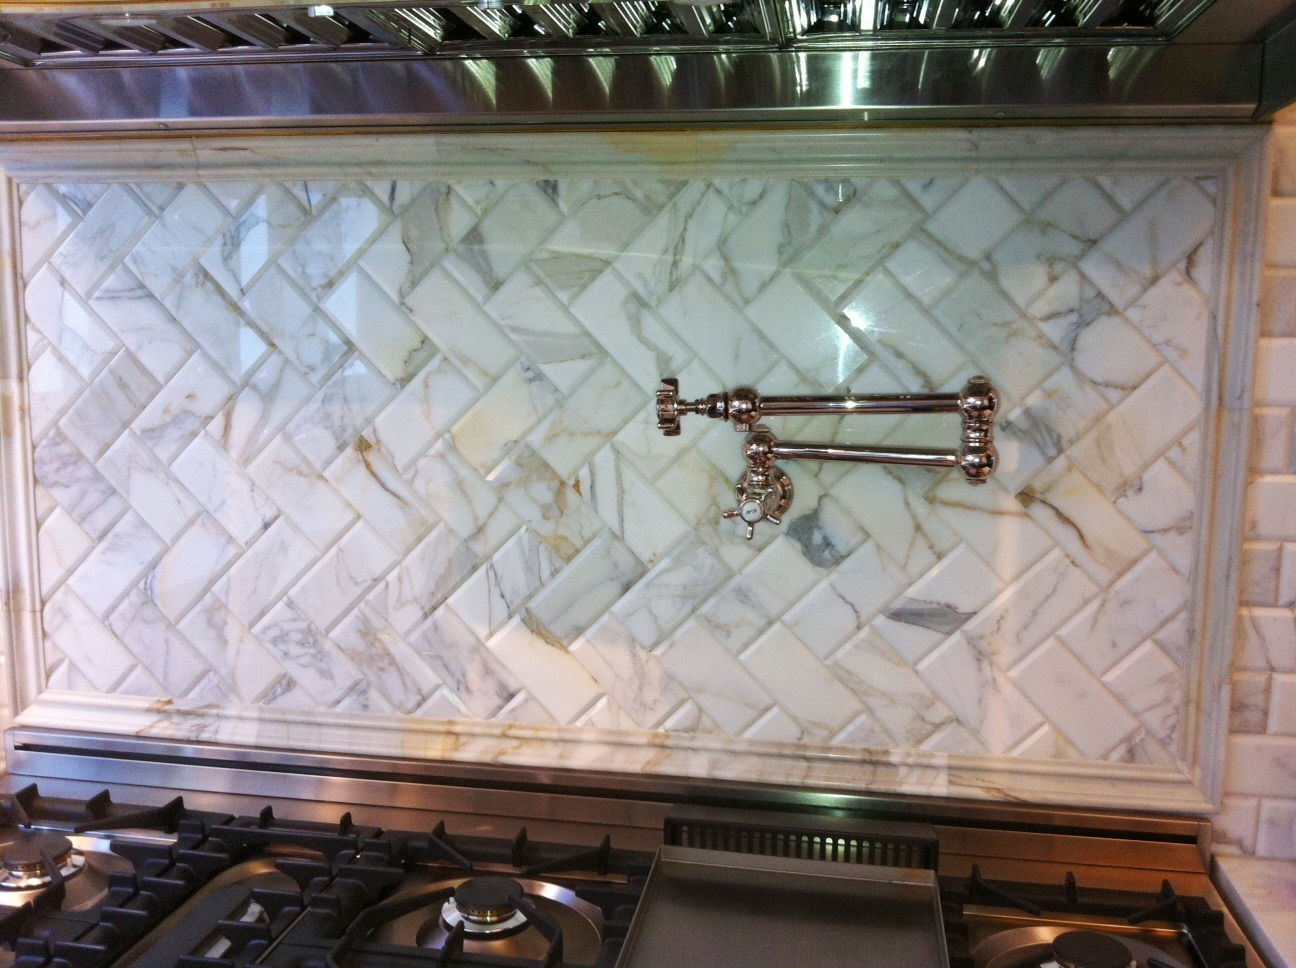 design kitchen inspiration herringbone backsplash home improvements refference mosaic tile patterns kitchen backsplash